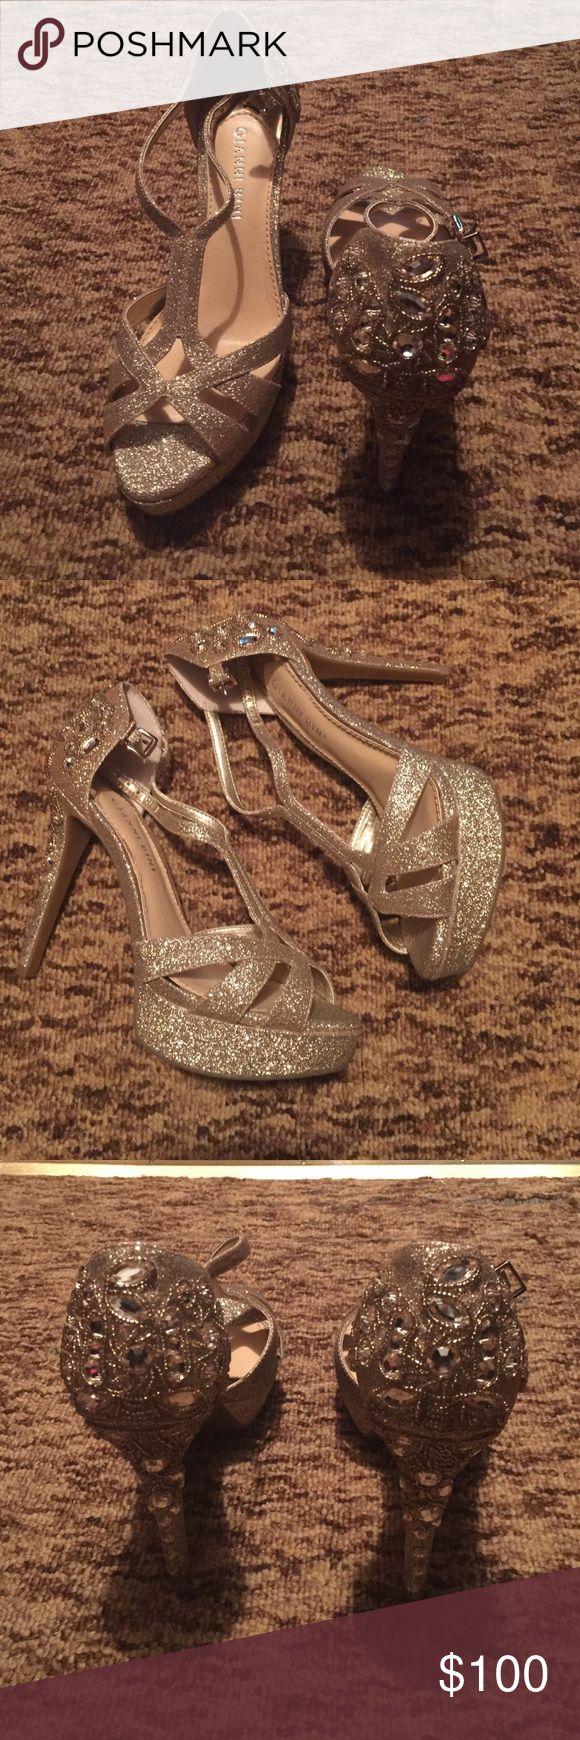 Gianni Bini Gold Platform Heels Gianni Bini Gold Platform Heels: only worn 1 time (prom). In great condition! Gianni Bini Shoes Heels